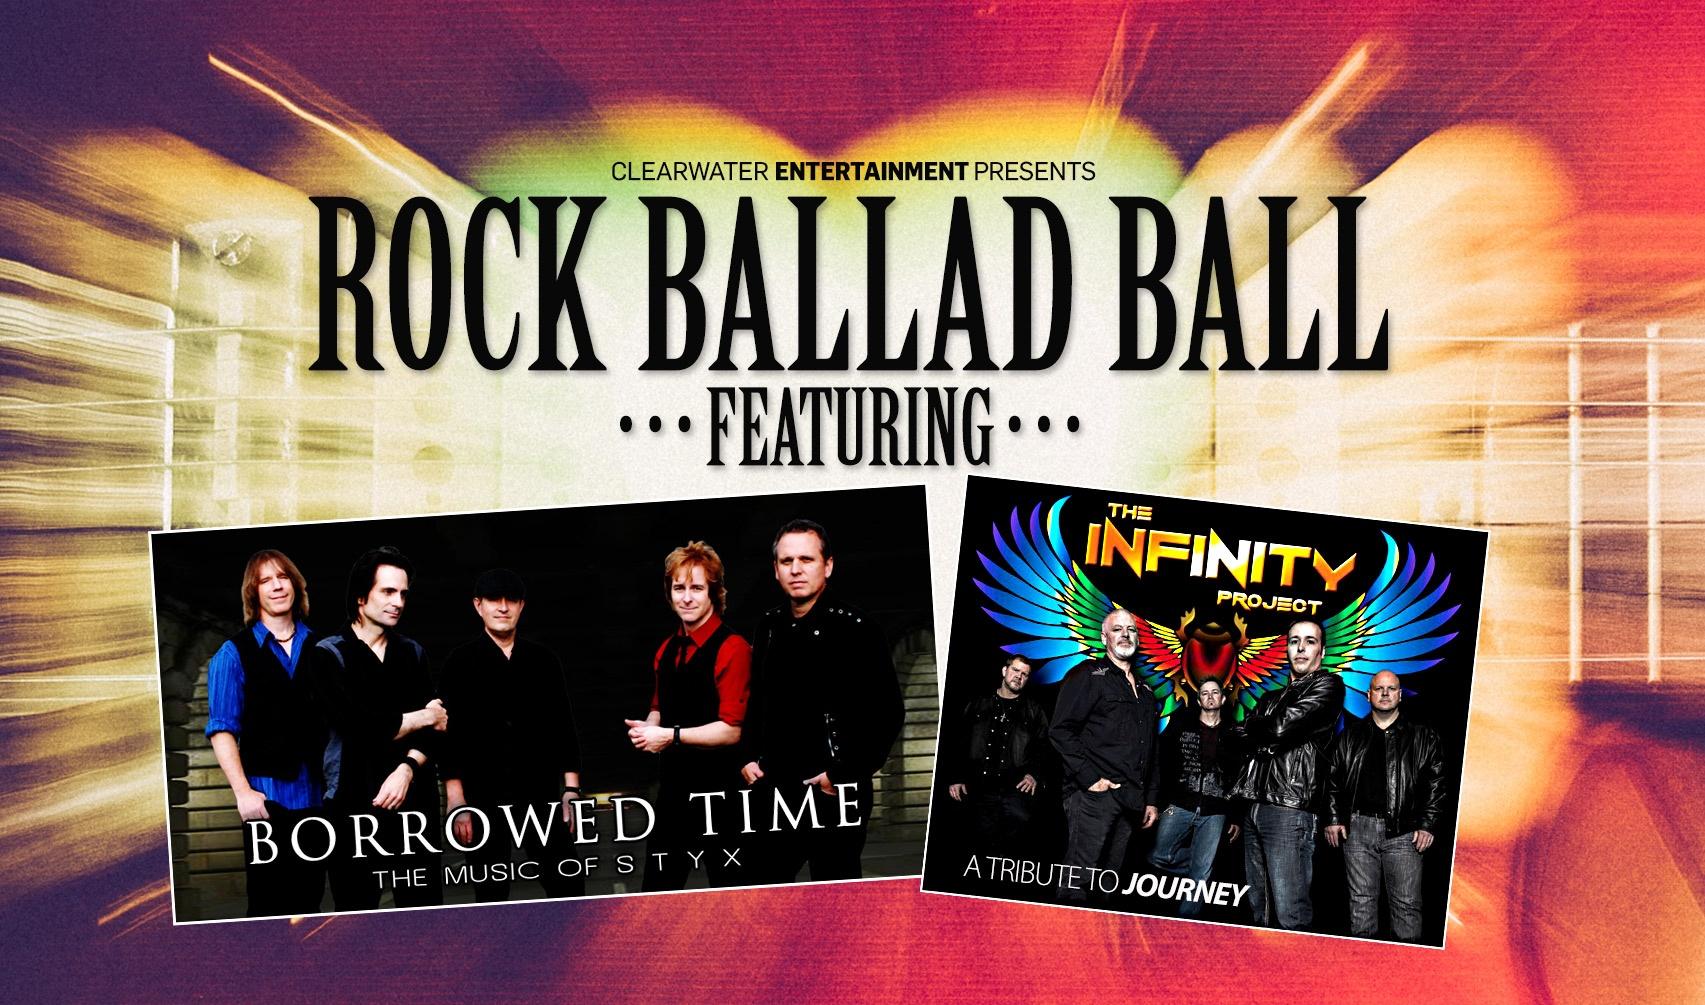 Rock Ballad Ball Feb 14th Clearwater Casino Event Center